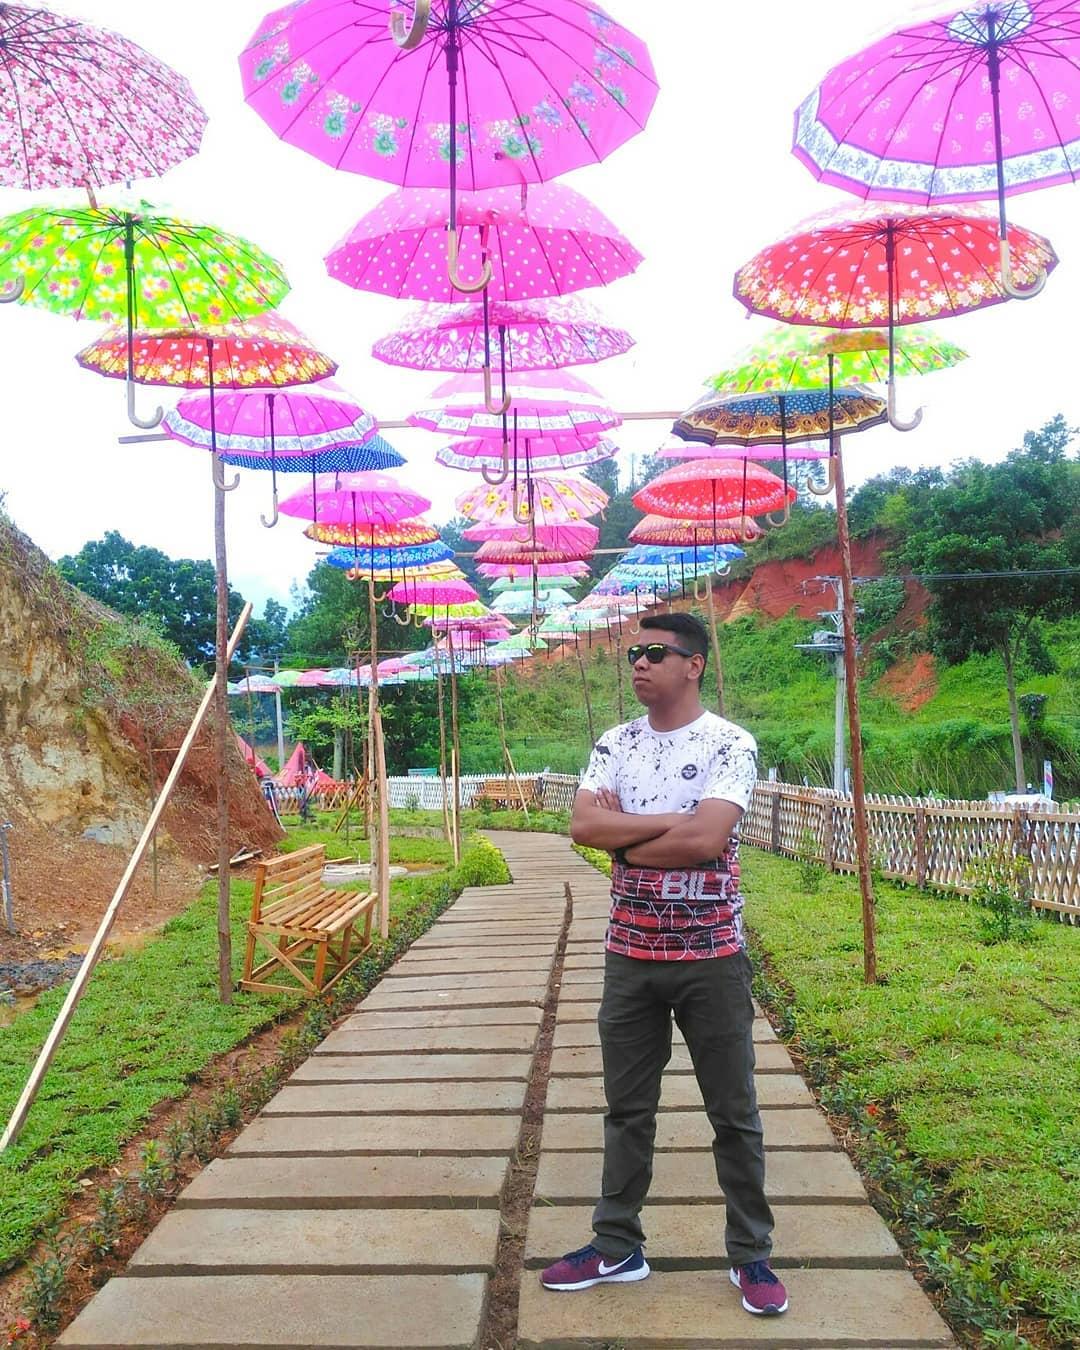 spot foto payung warna-warni di bukit kelinci payakumbuh